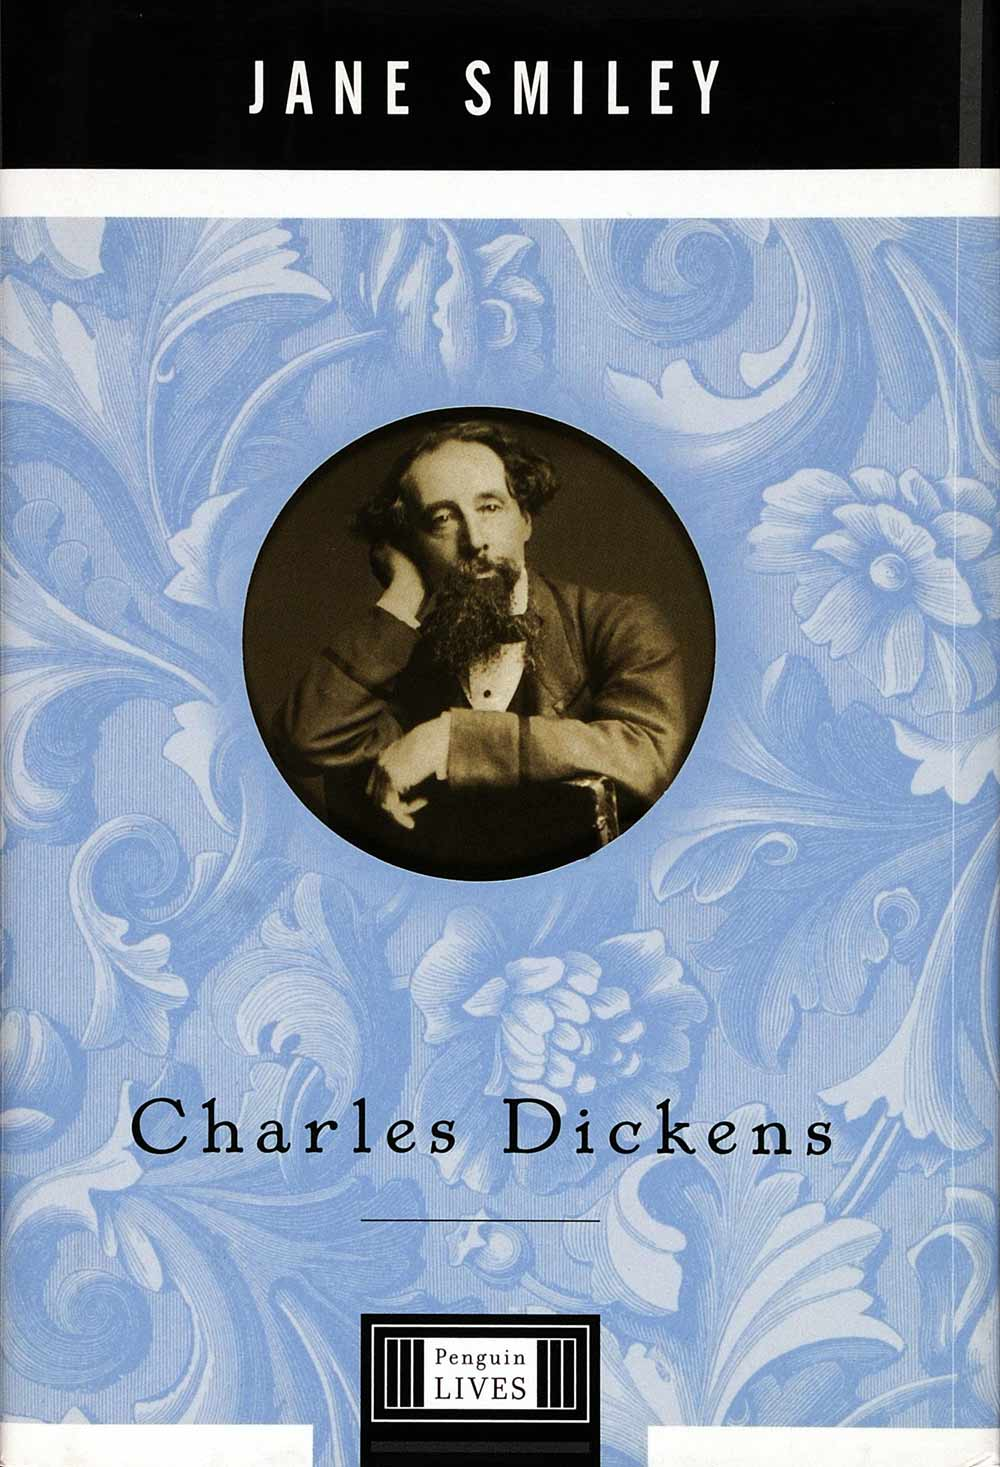 Jane Smiley. Charles Dickens. New York: Viking, 2002